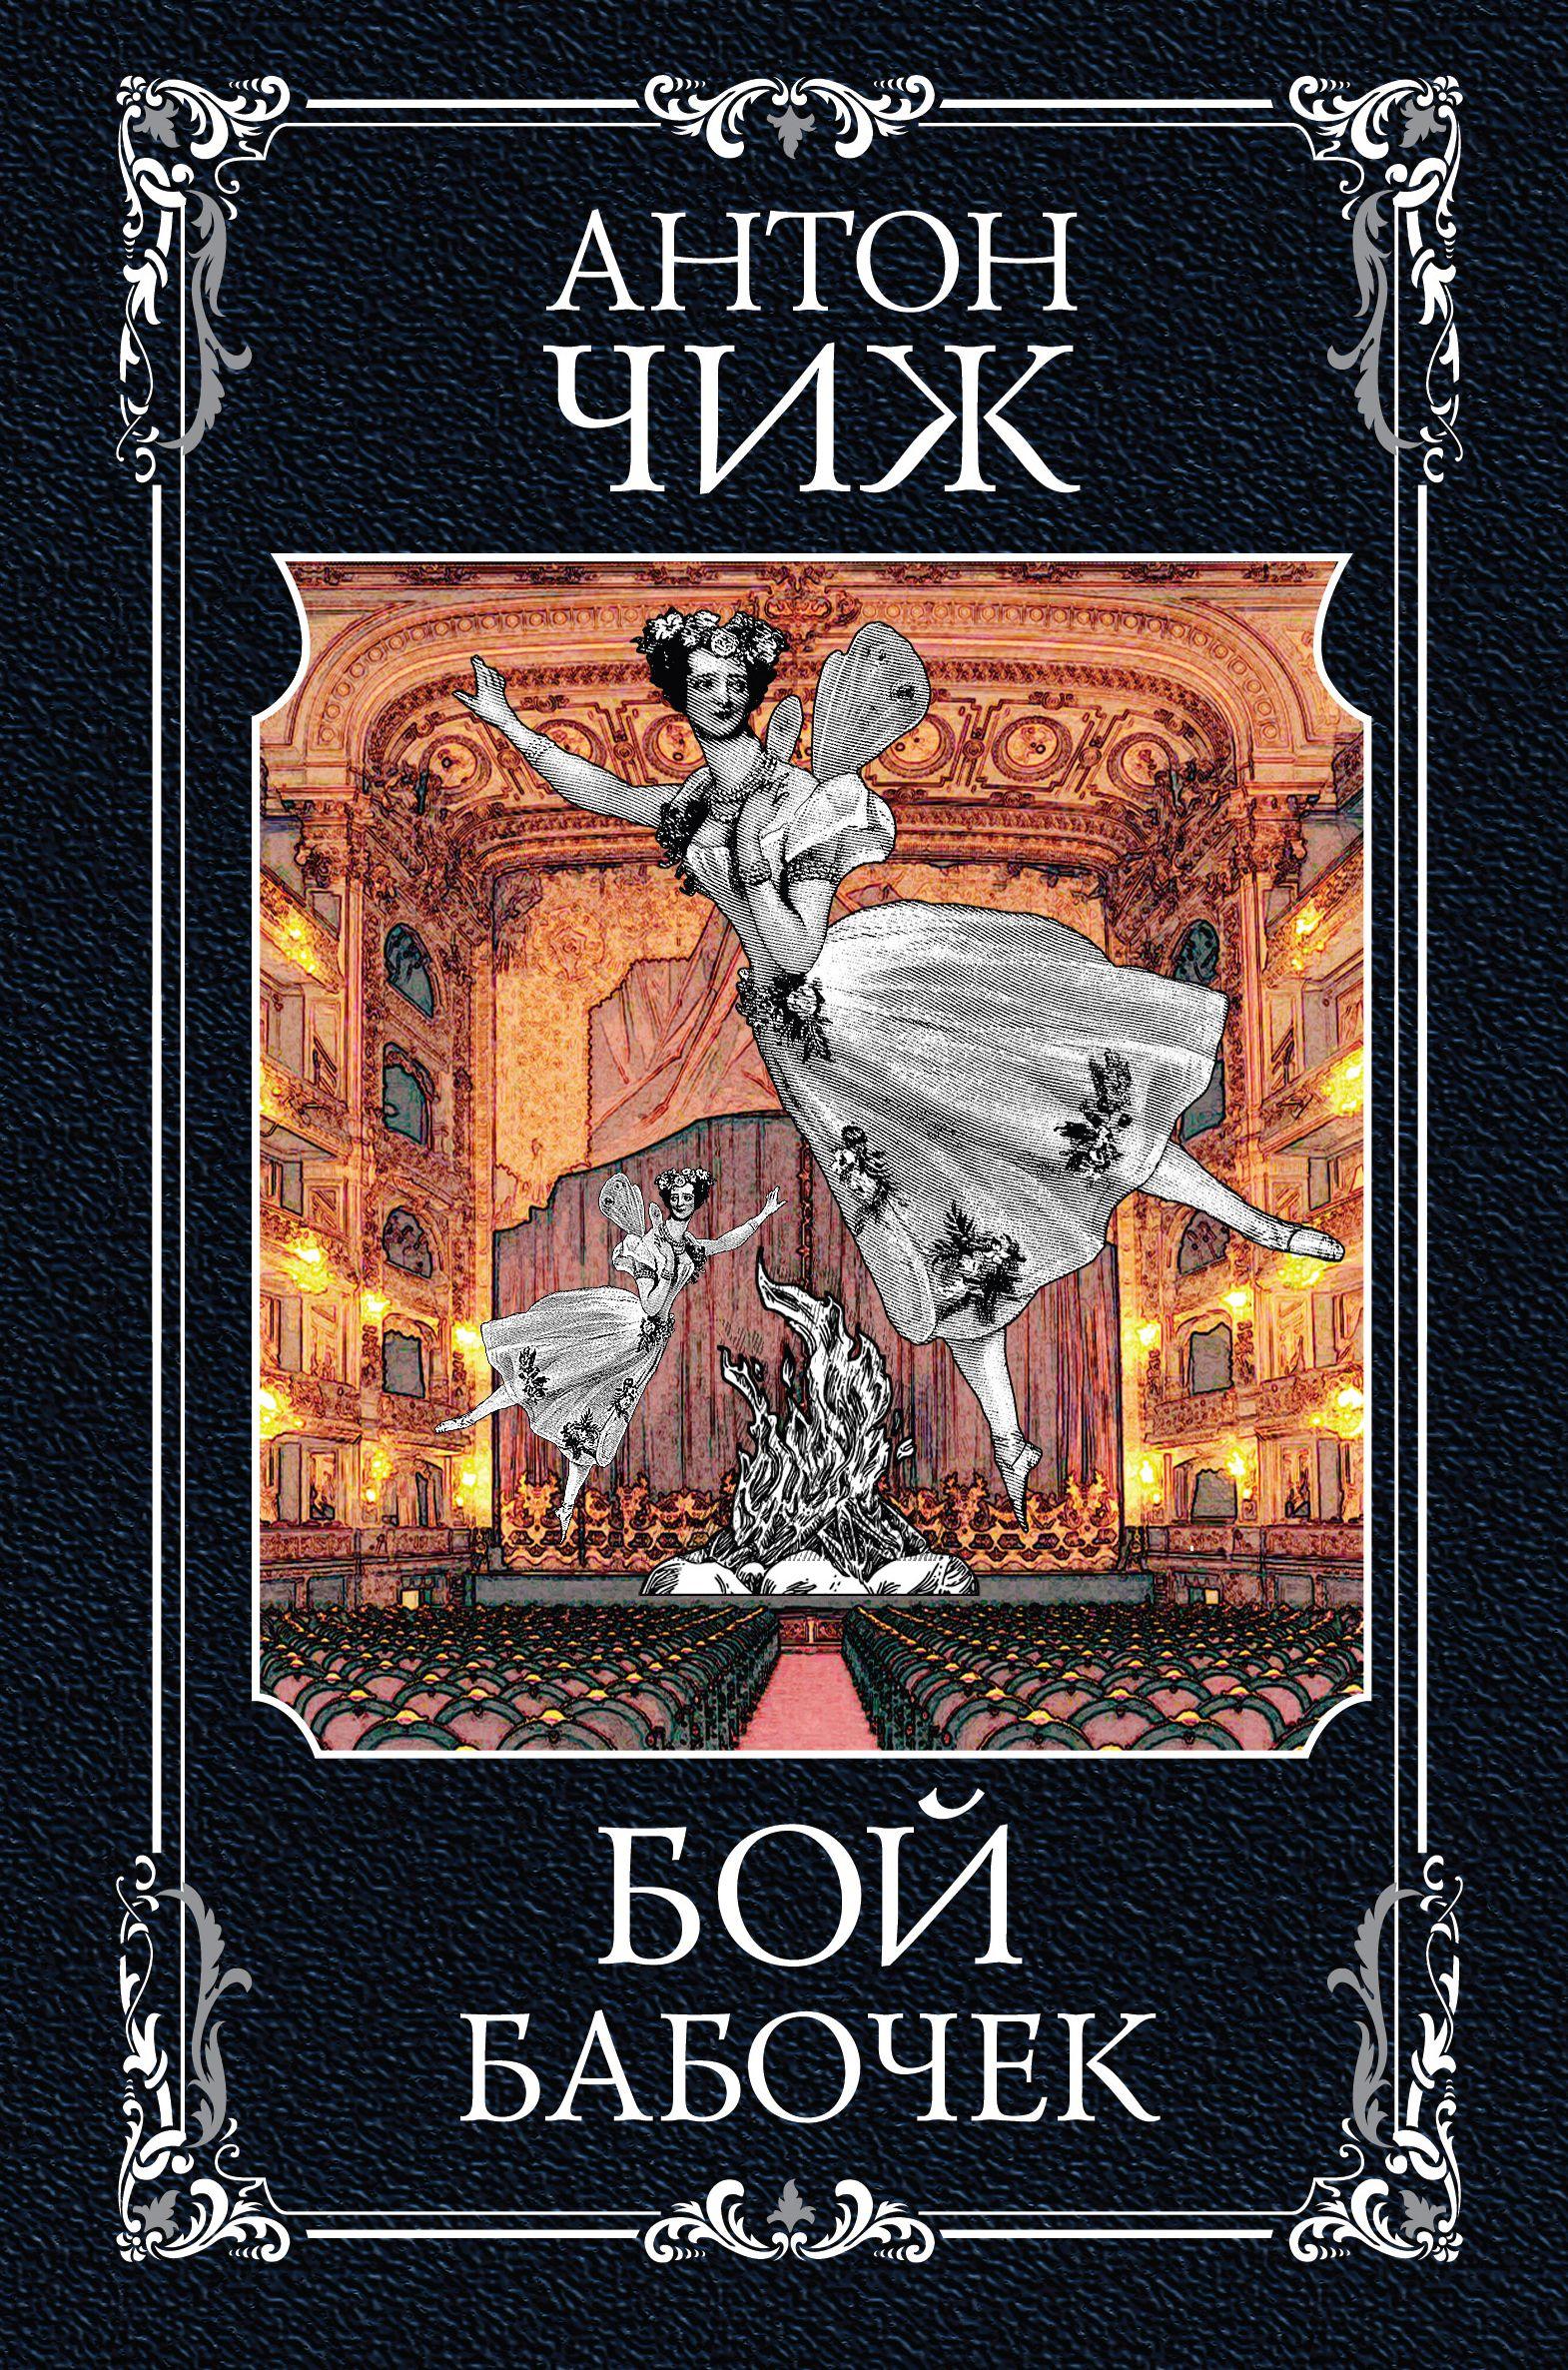 Купить книгу Бой бабочек, автора Антона Чижа